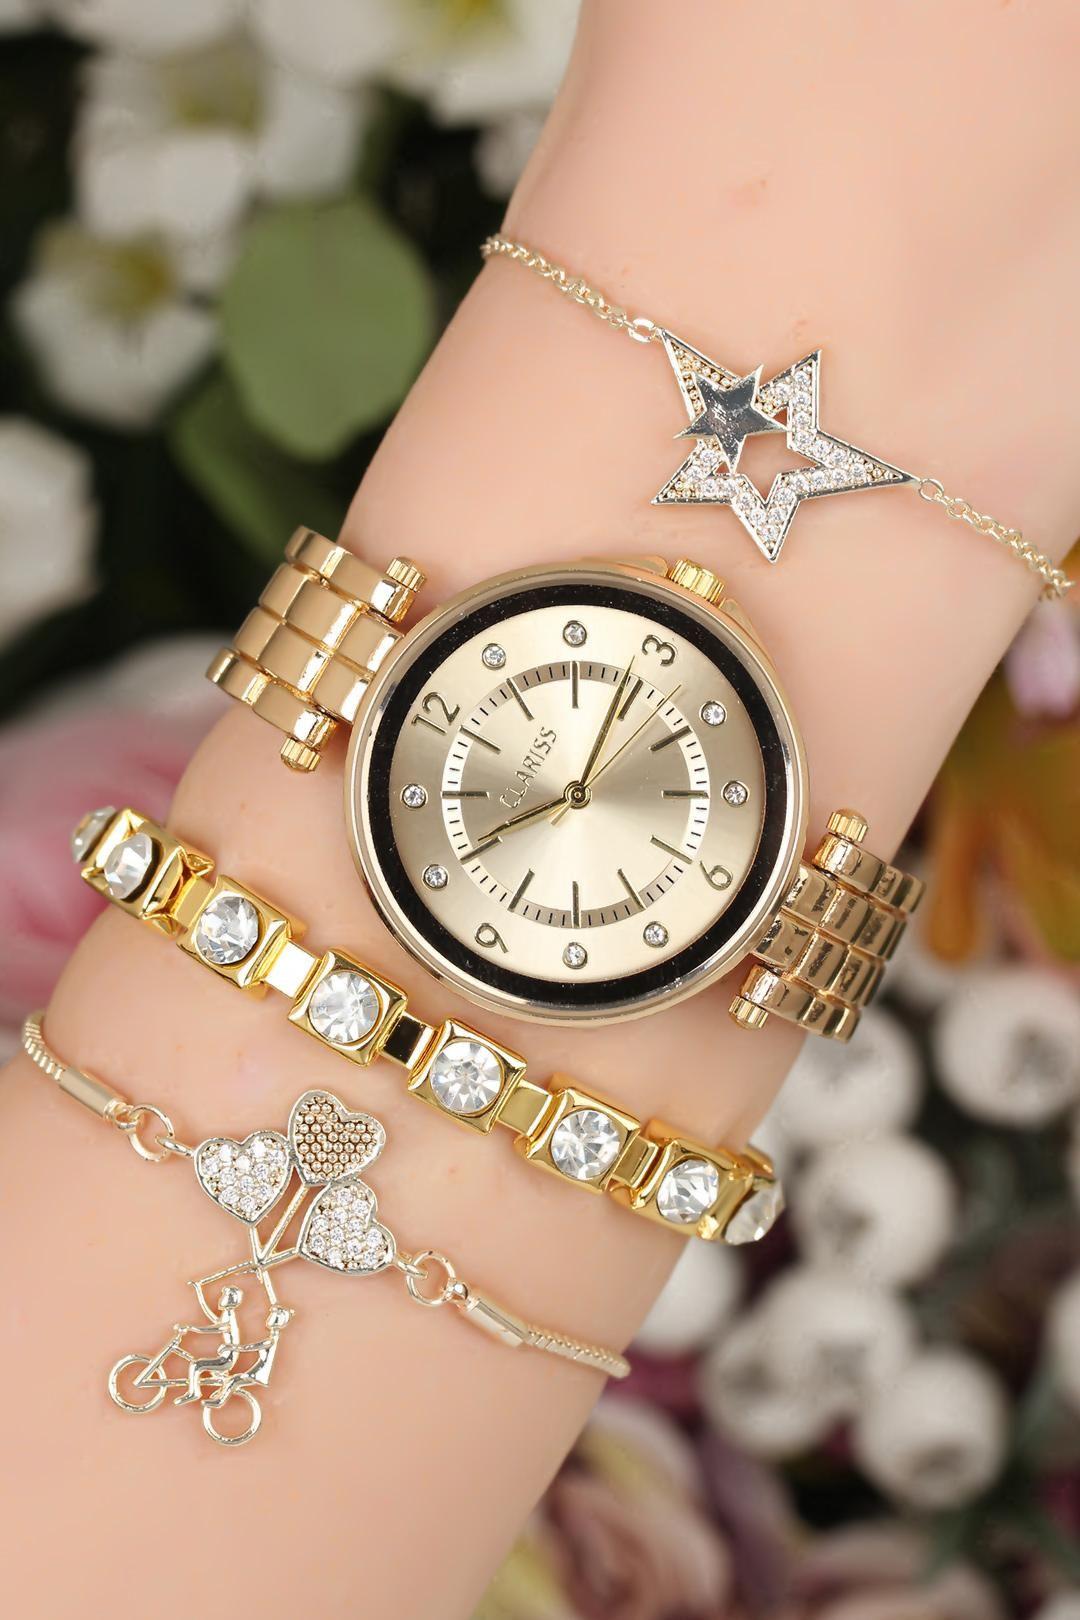 Metal Kordonlu Clariss Marka Bayan Saat Bileklik Kombini Bayan Saatleri Bileklik Metal